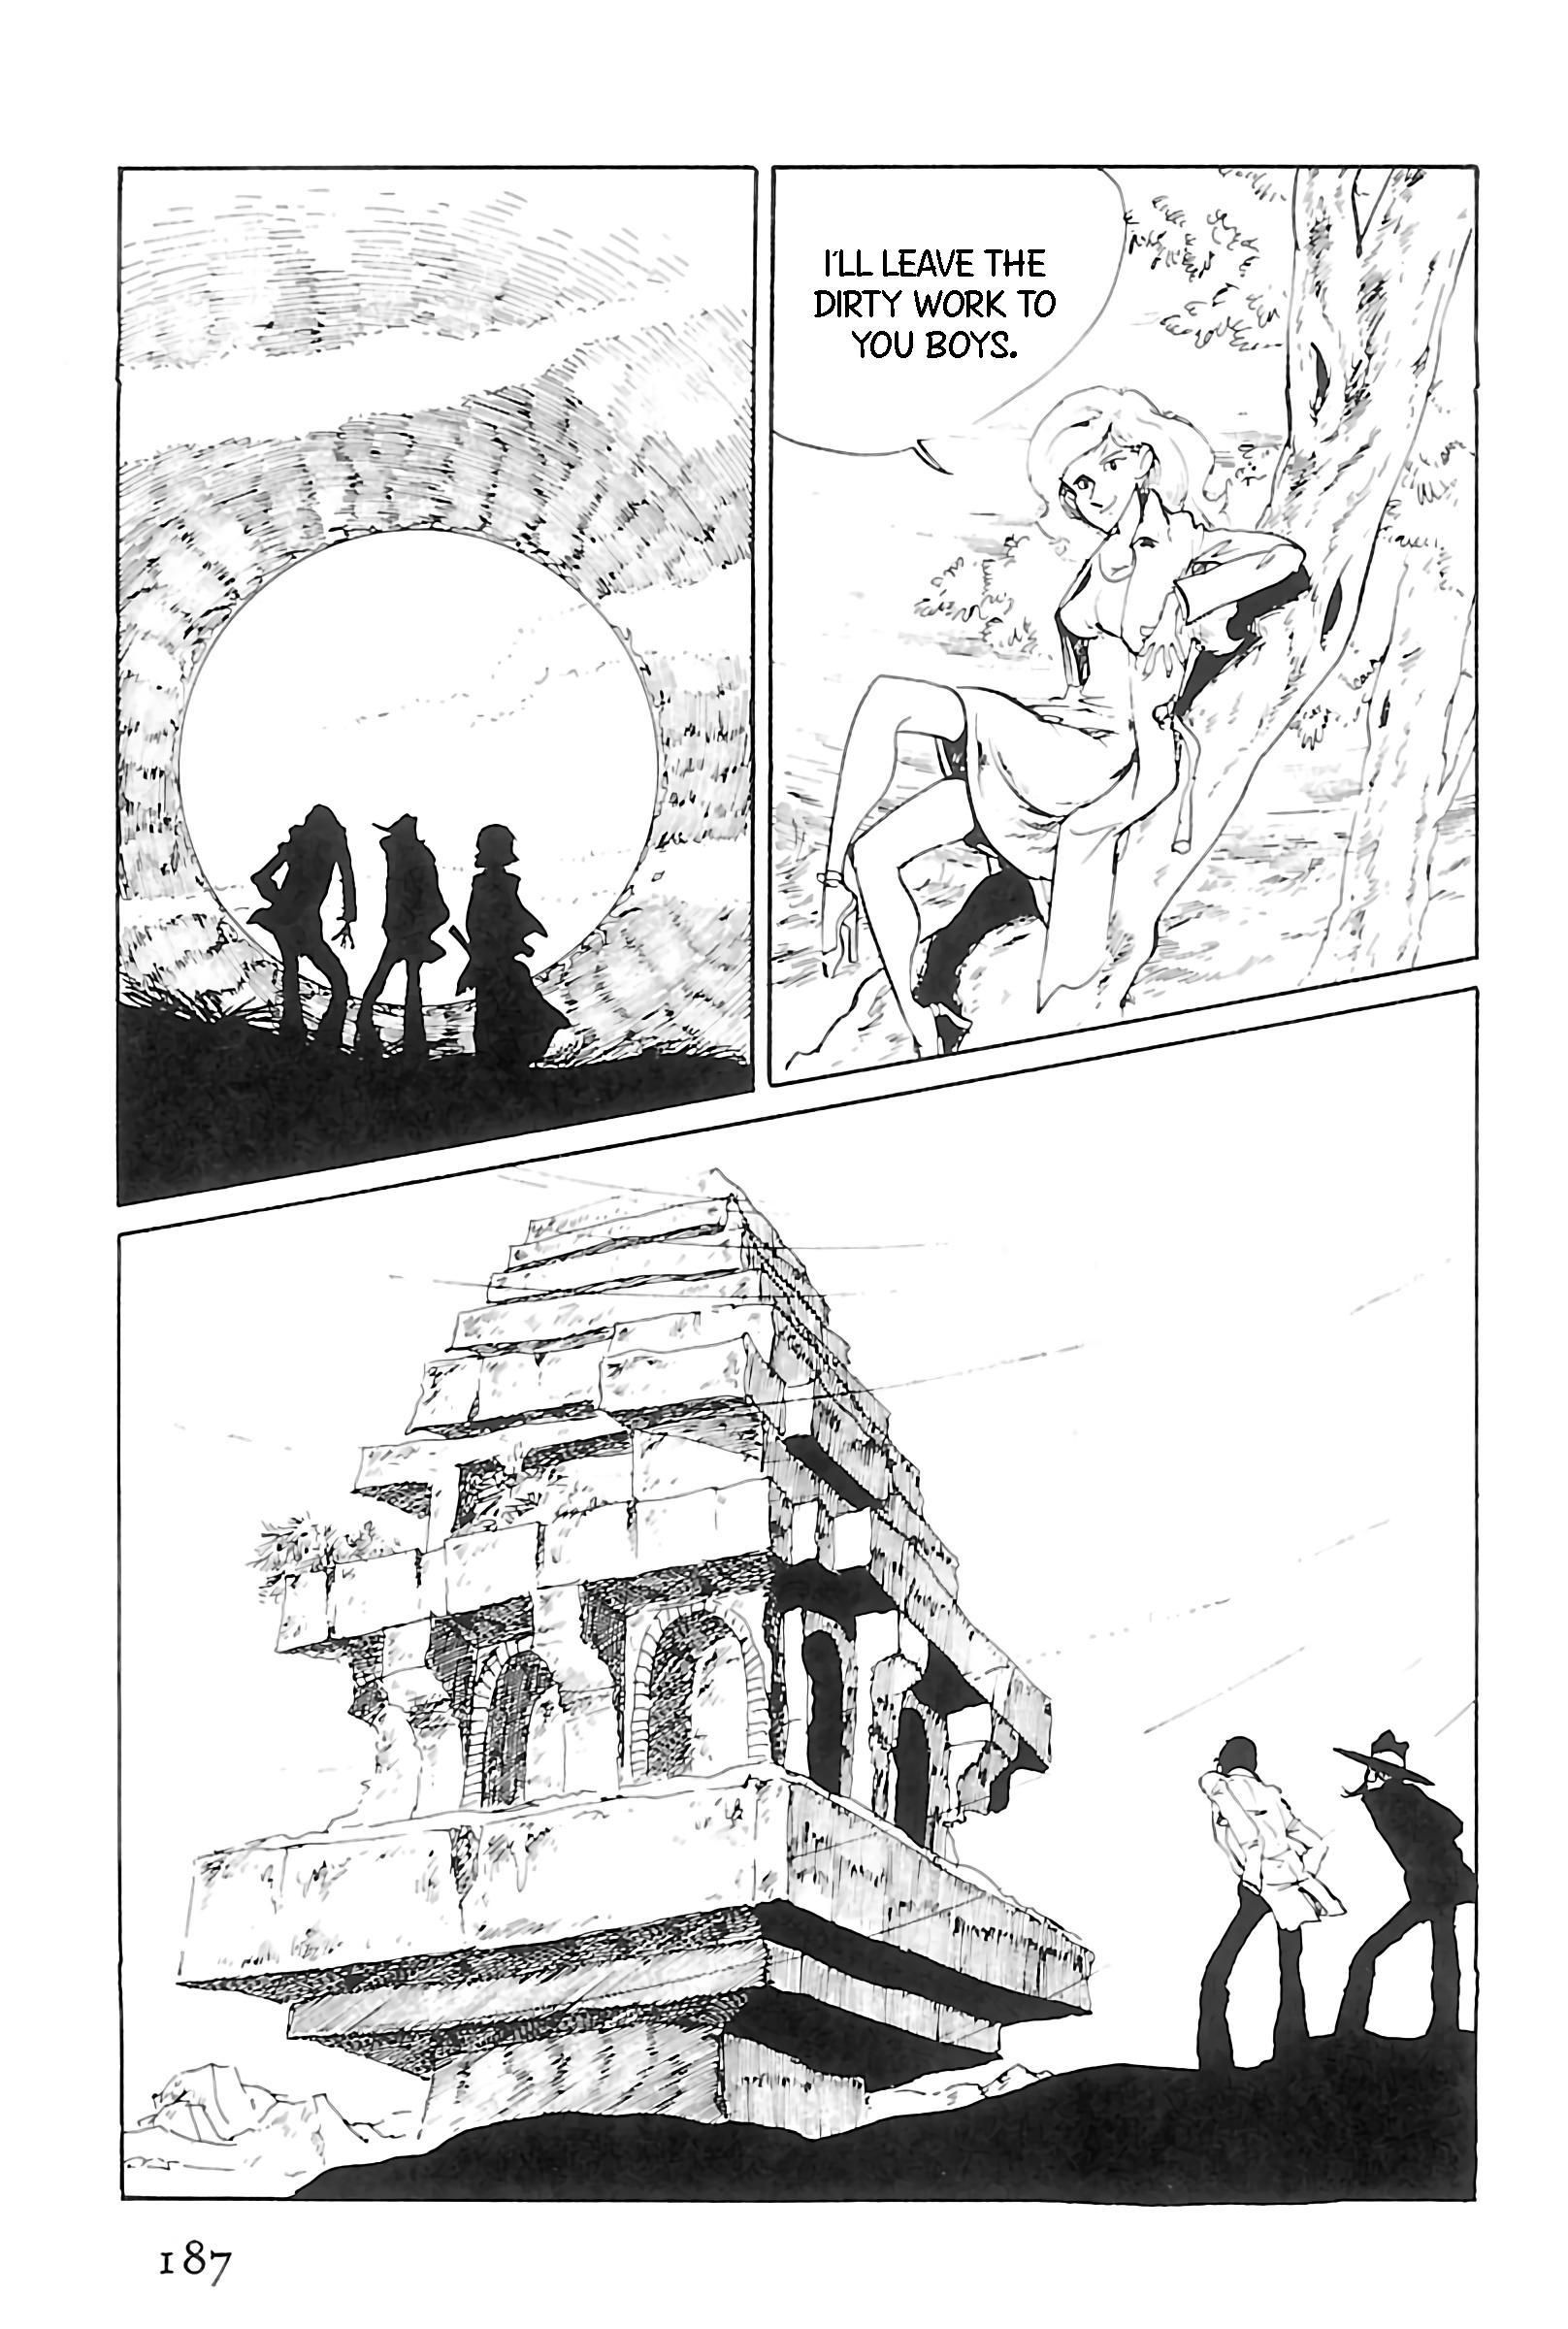 Lupin Iii: World'S Most Wanted Vol.11 Chapter 124: Happy New Year, Lupin! page 9 - Mangakakalots.com